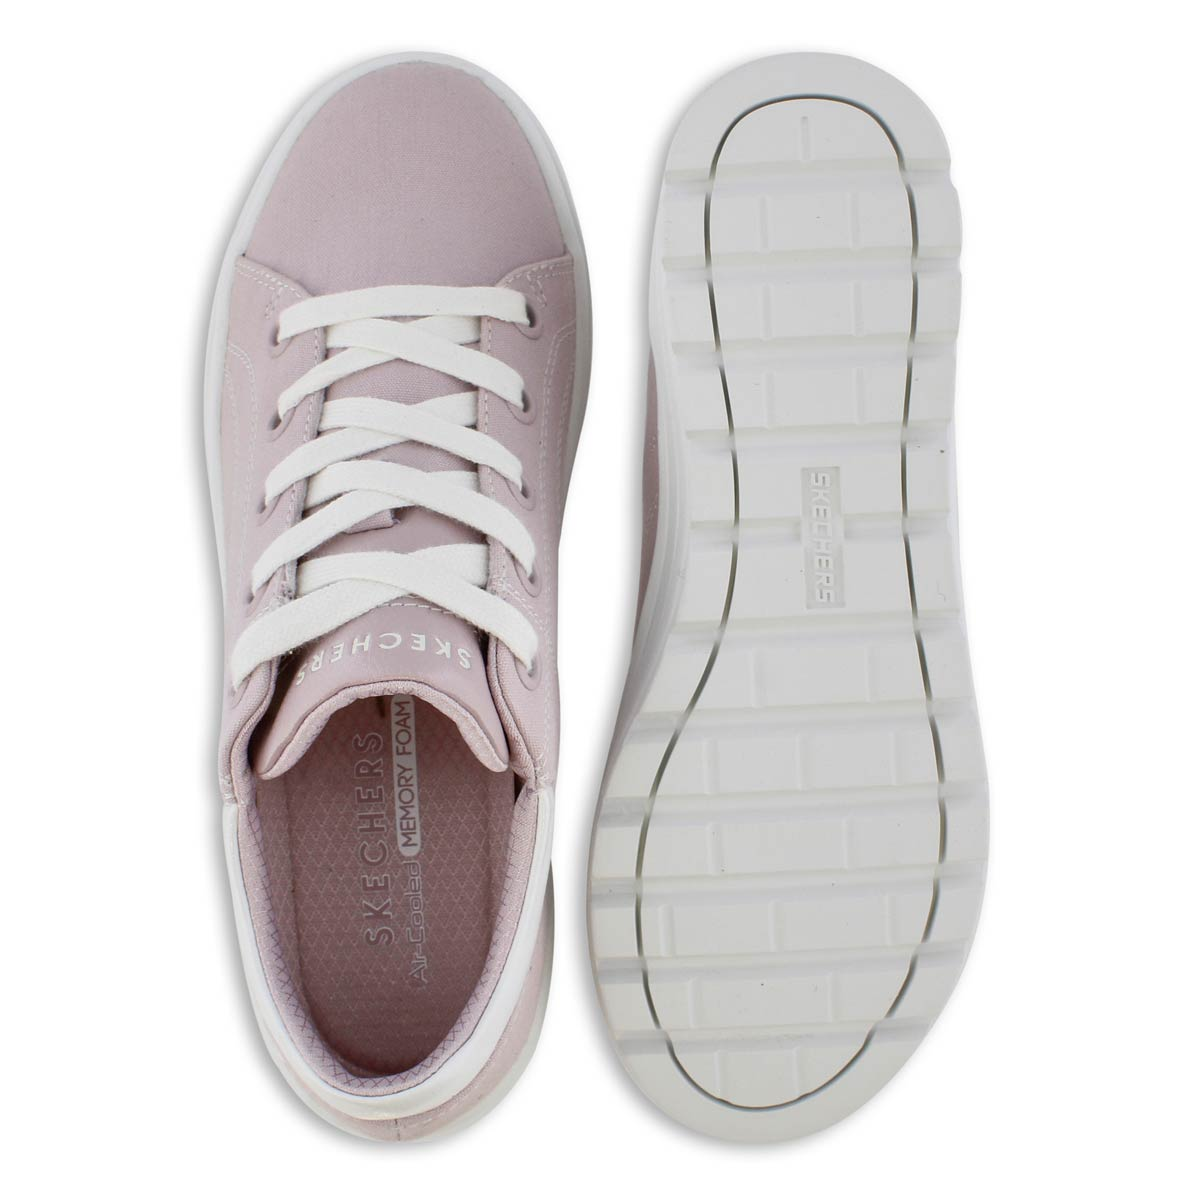 Lds Street Cleats 2 lvndr fashion snkr